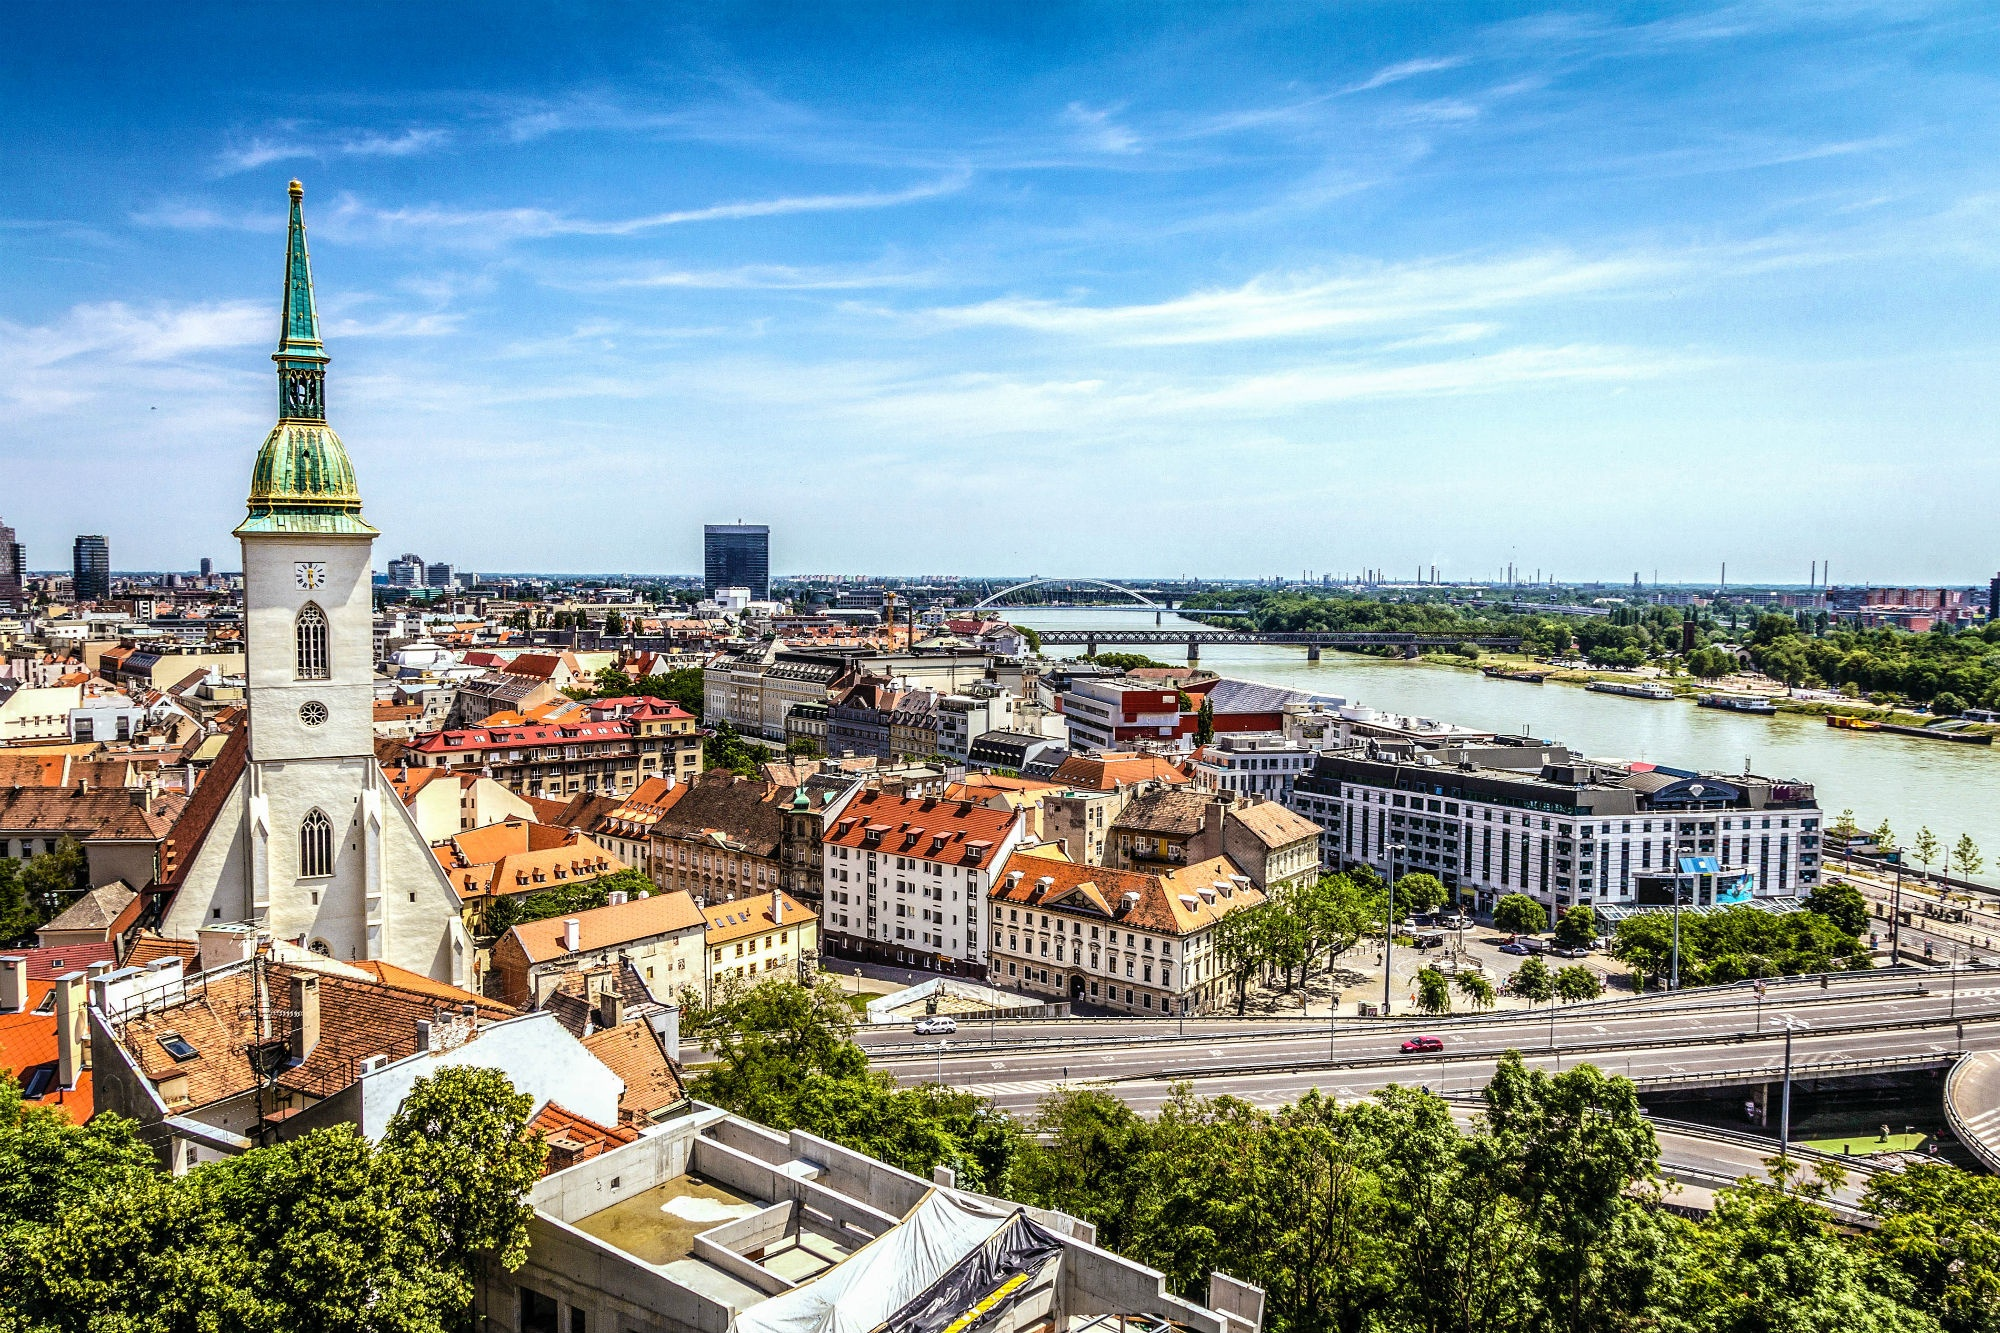 https://0501.nccdn.net/4_2/000/000/038/2d3/Bratislava-skyline-iStock_36577368_LARGE-2-small-2000x1333.jpg